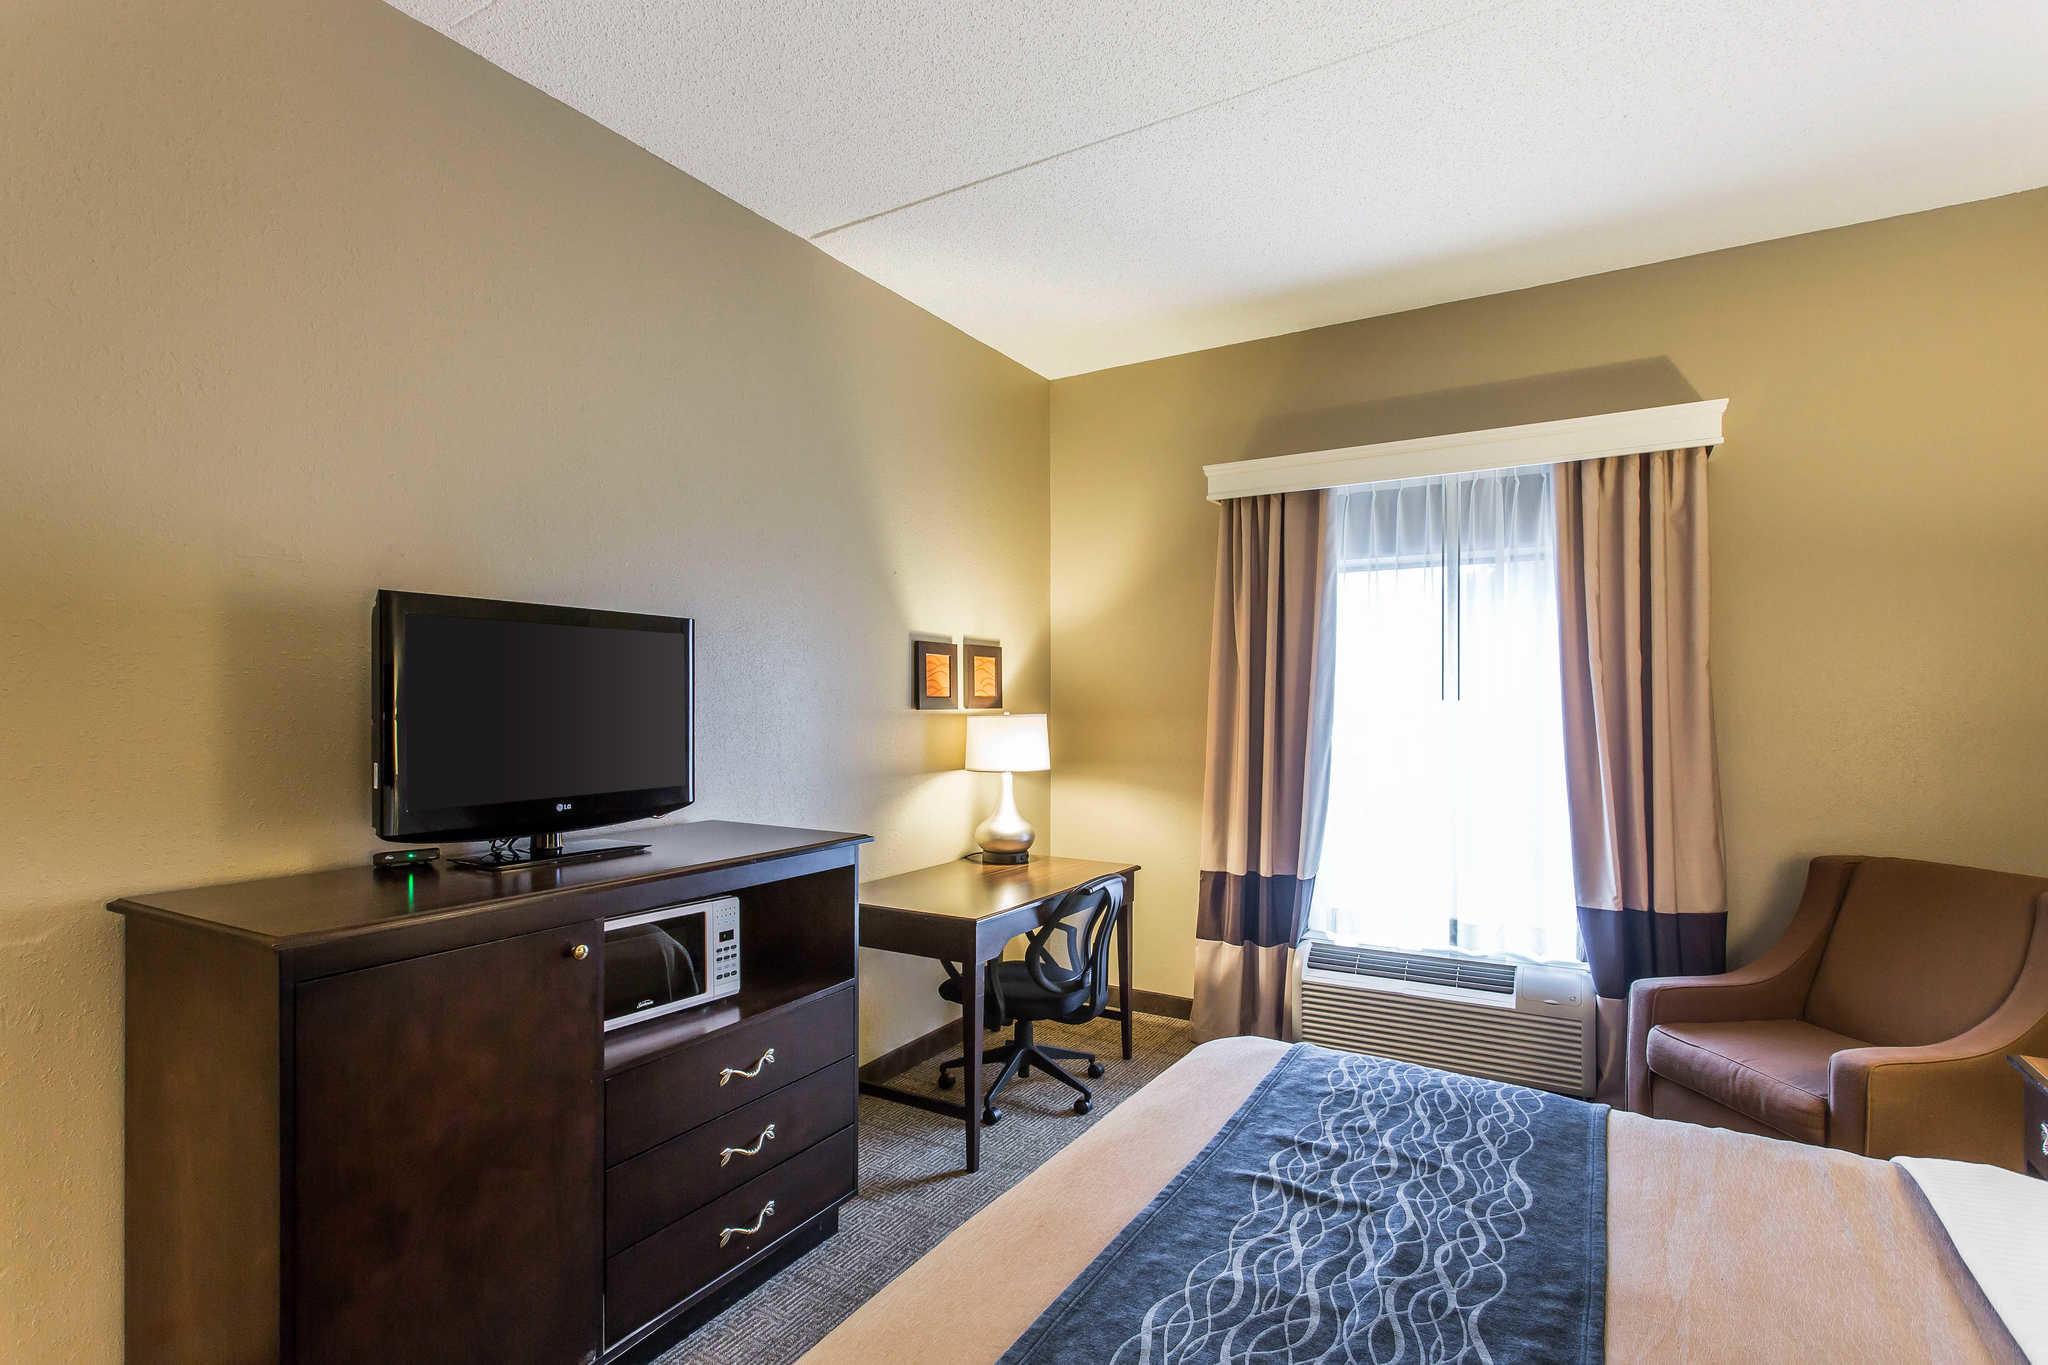 Comfort Inn & Suites image 6